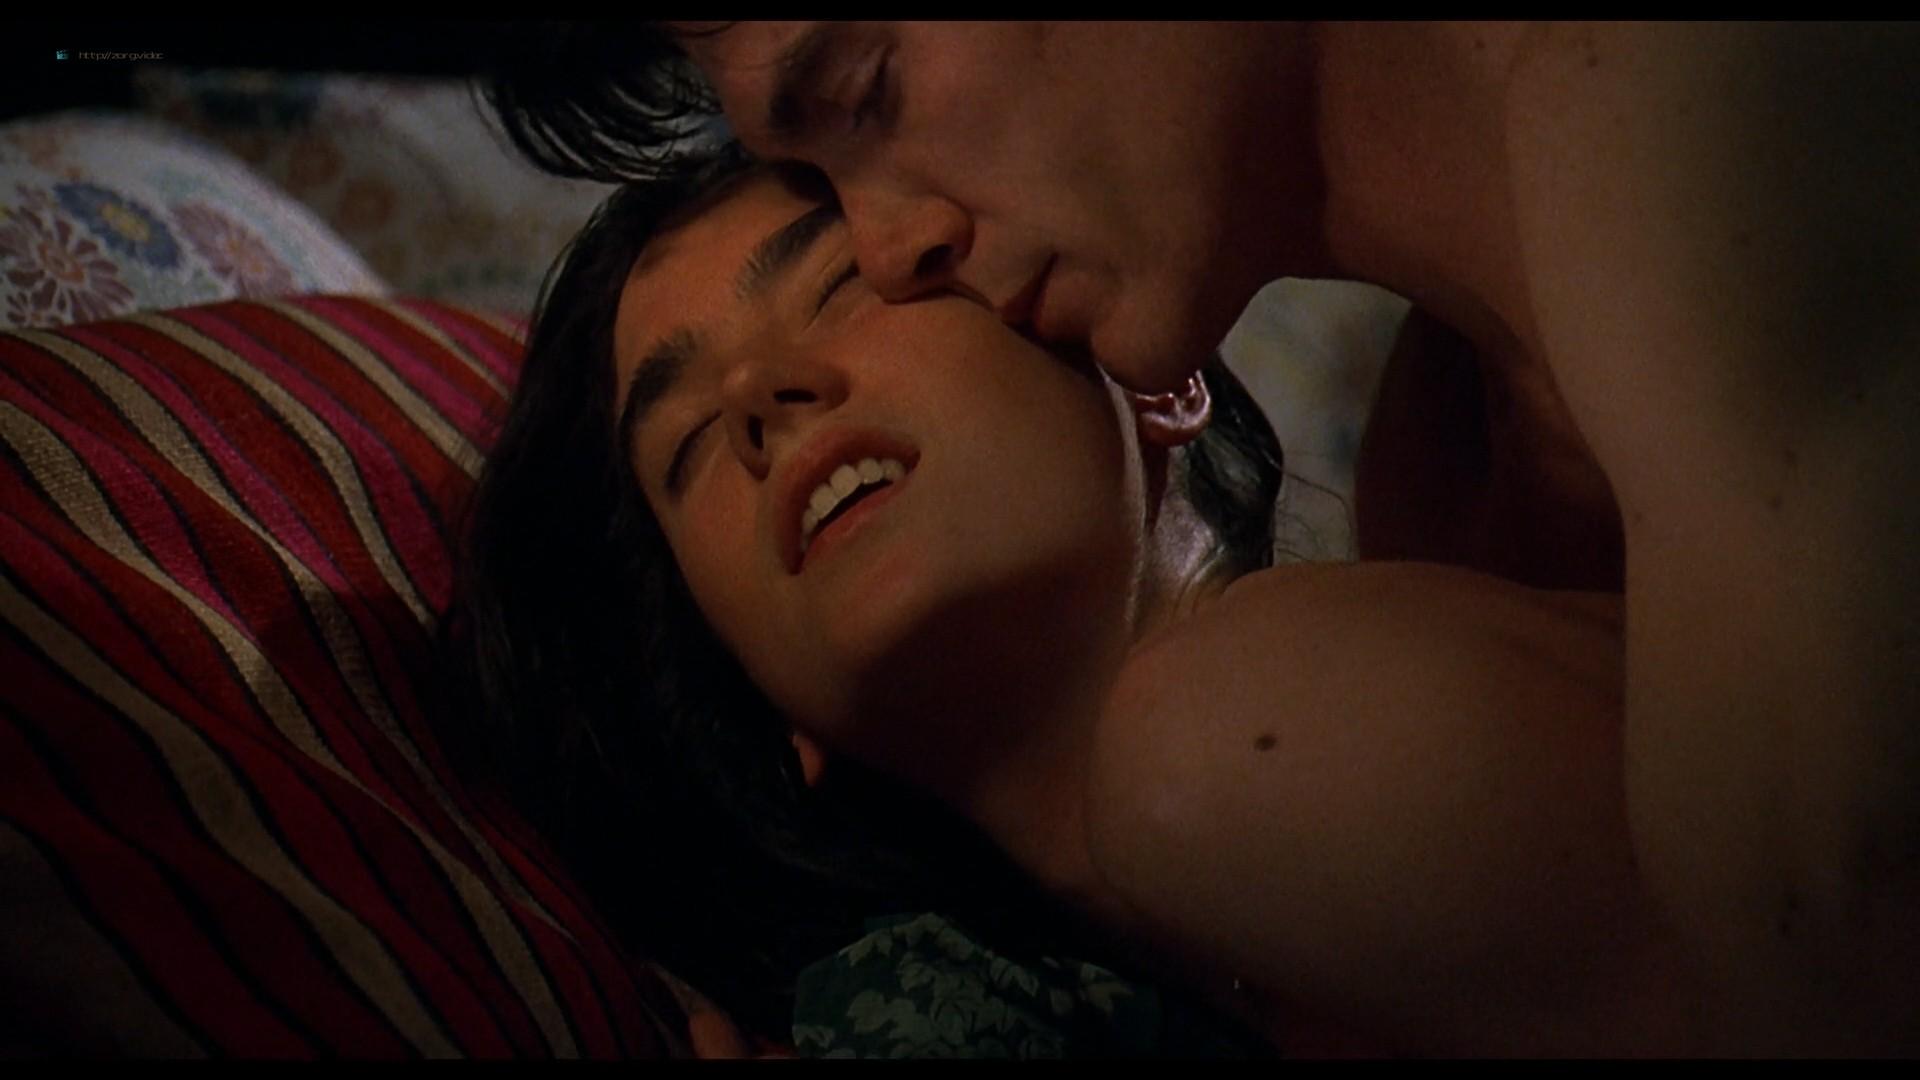 Jennifer Connelly nude side boob sex in – Waking the Dead (2000) HD 1080p BluRay (8)